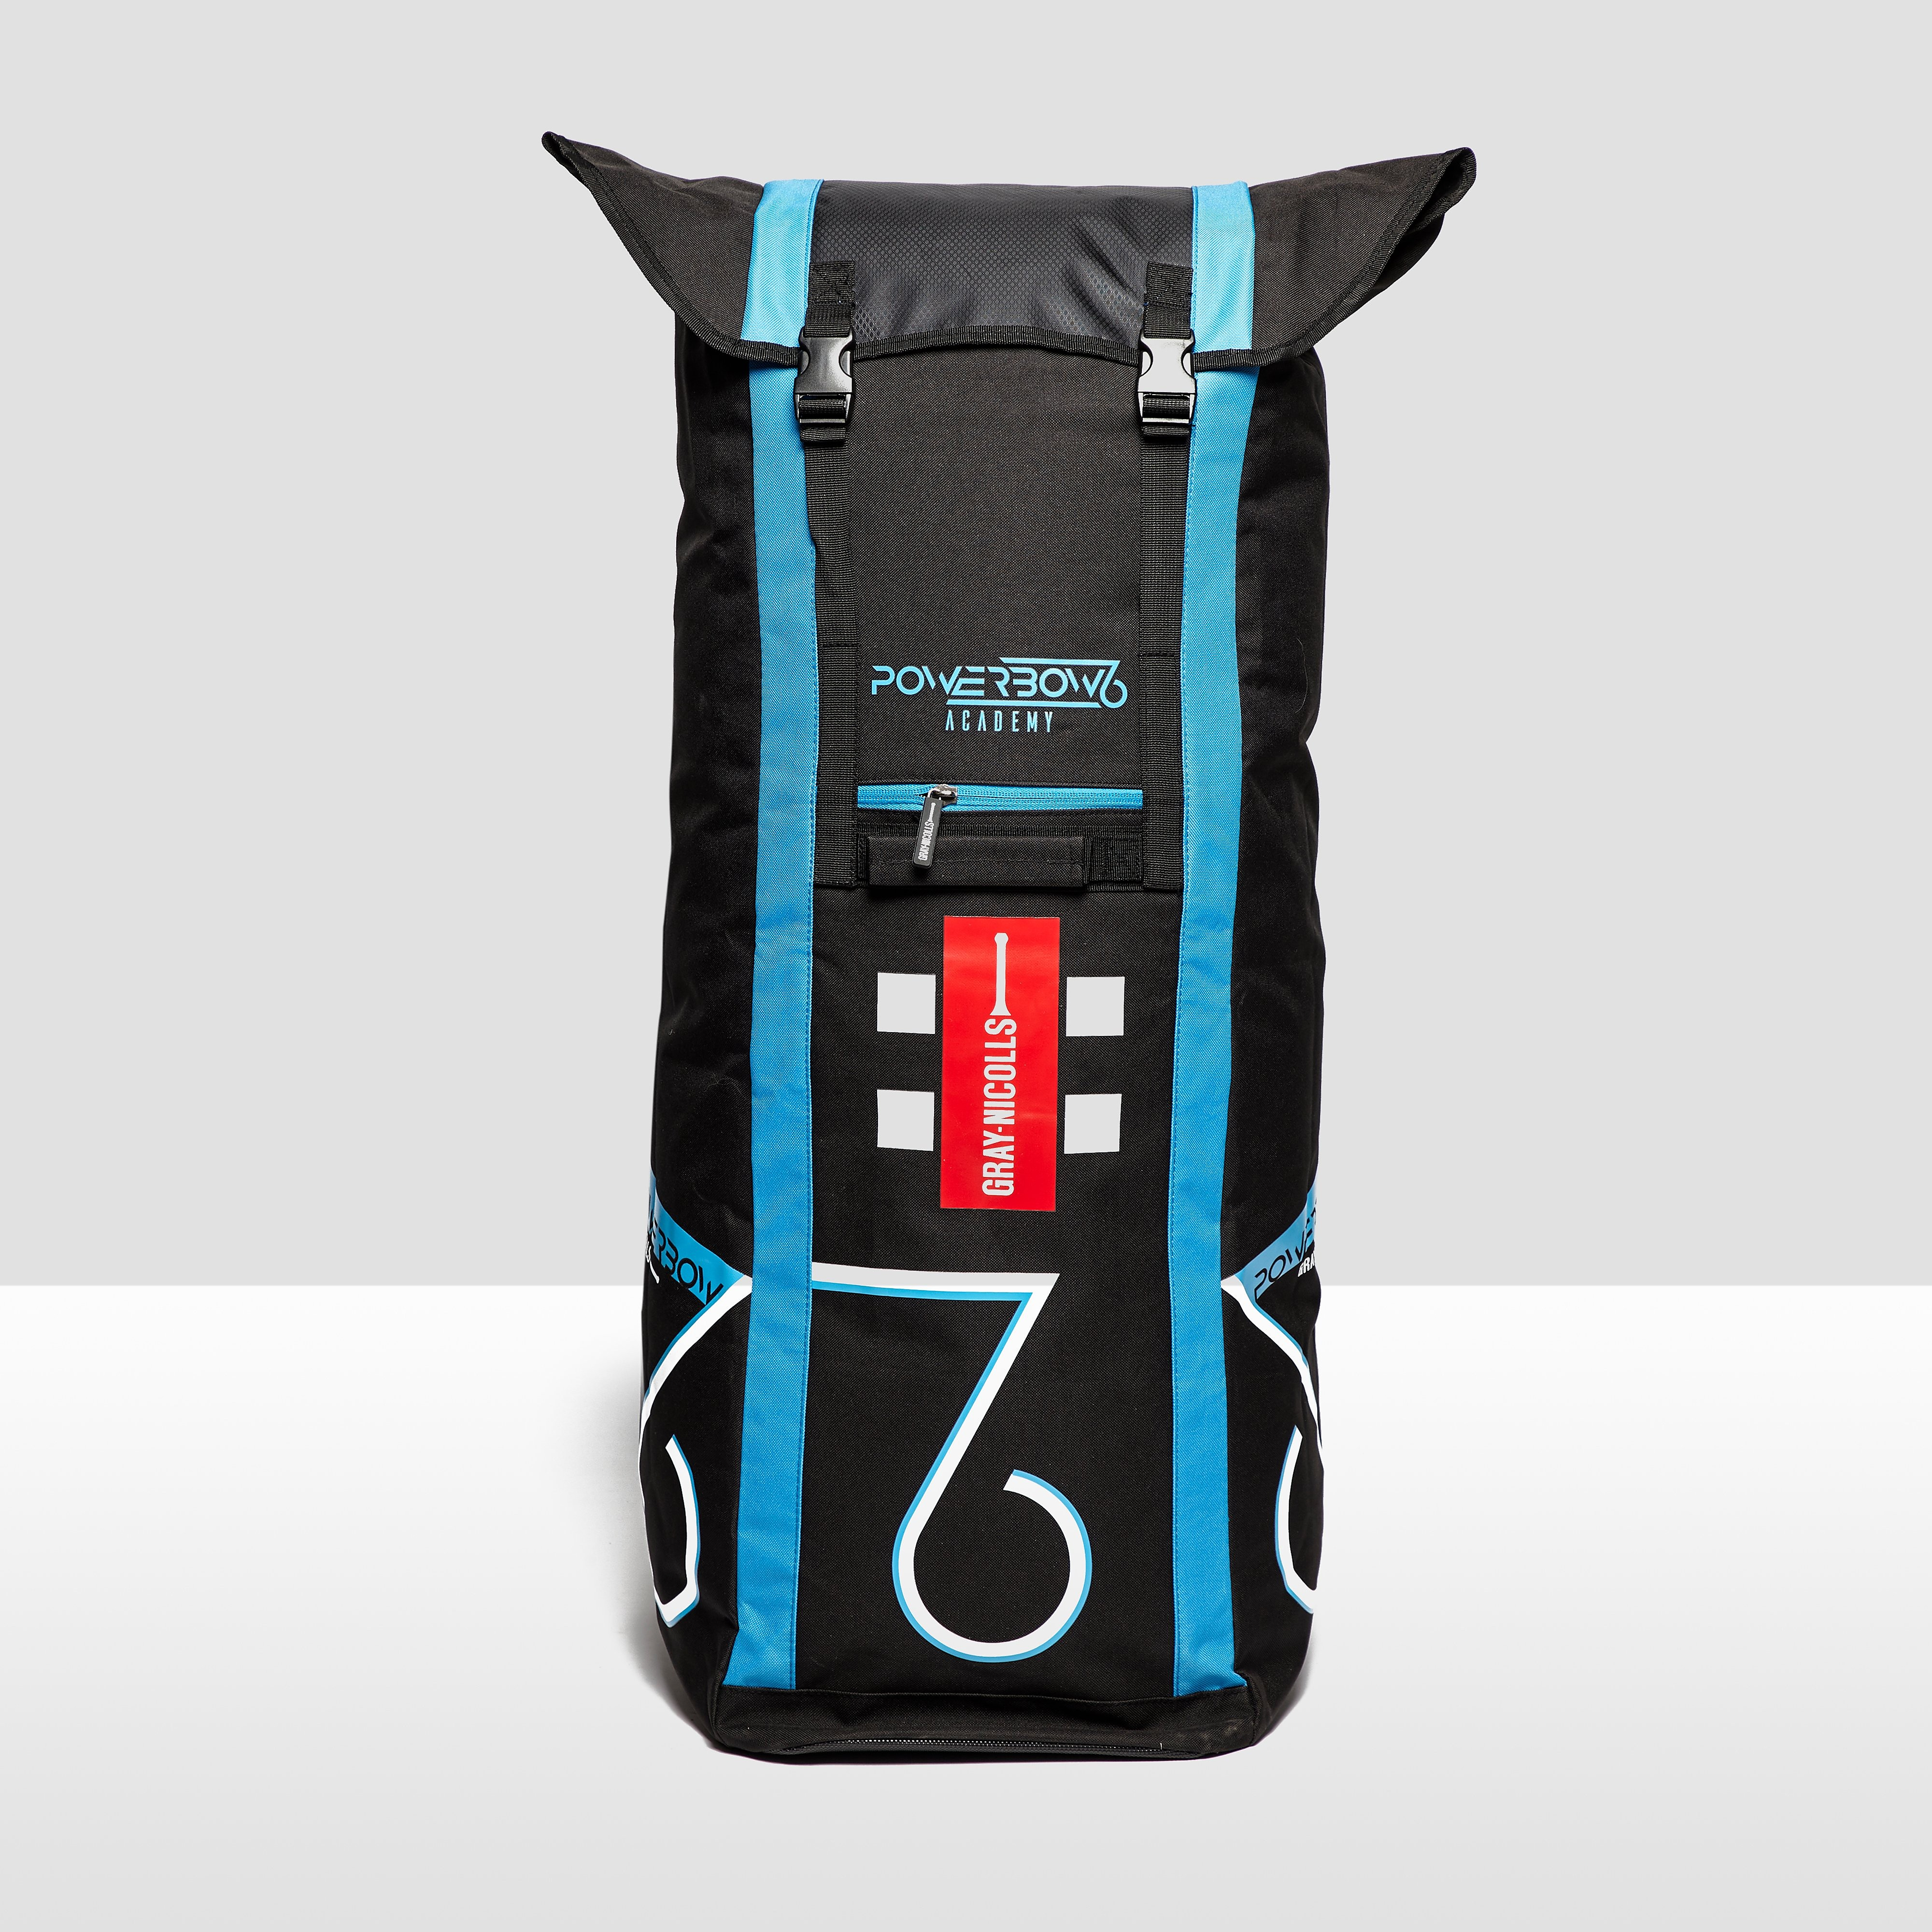 Gray Nicolls Powerbow 6 Academy Duffle Bag